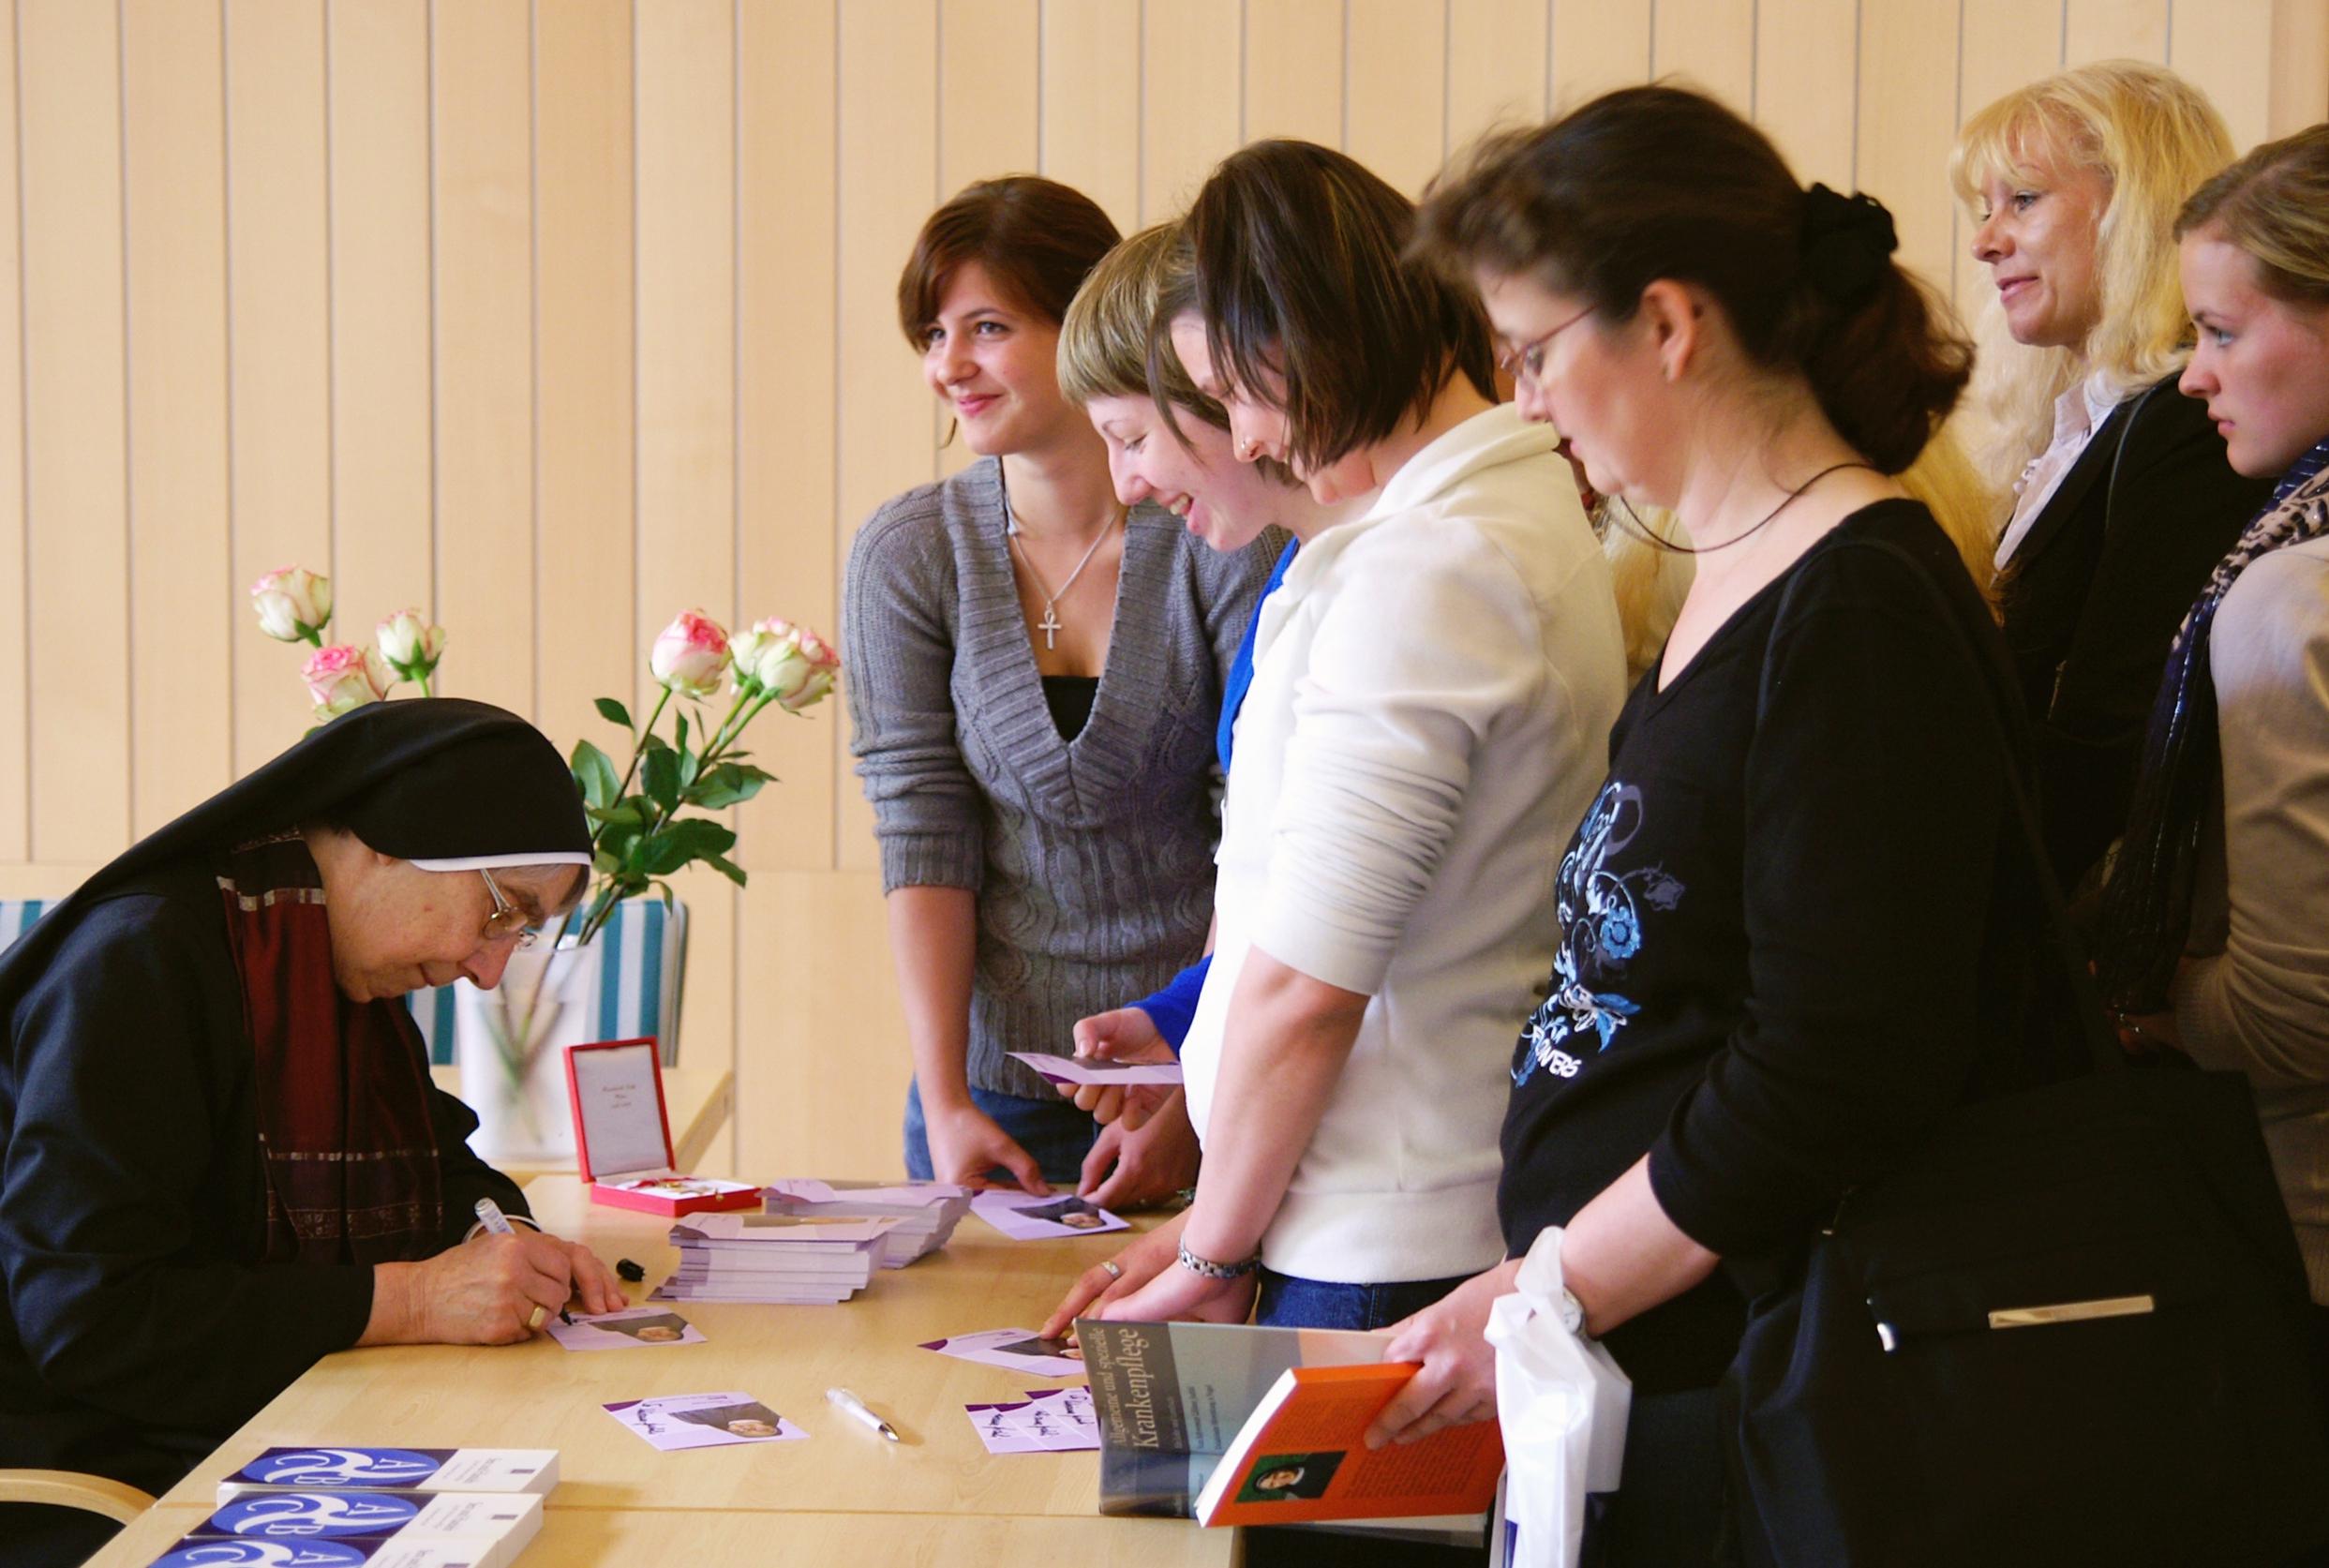 Autogrammstunde mit Sr. Liliane Juchli